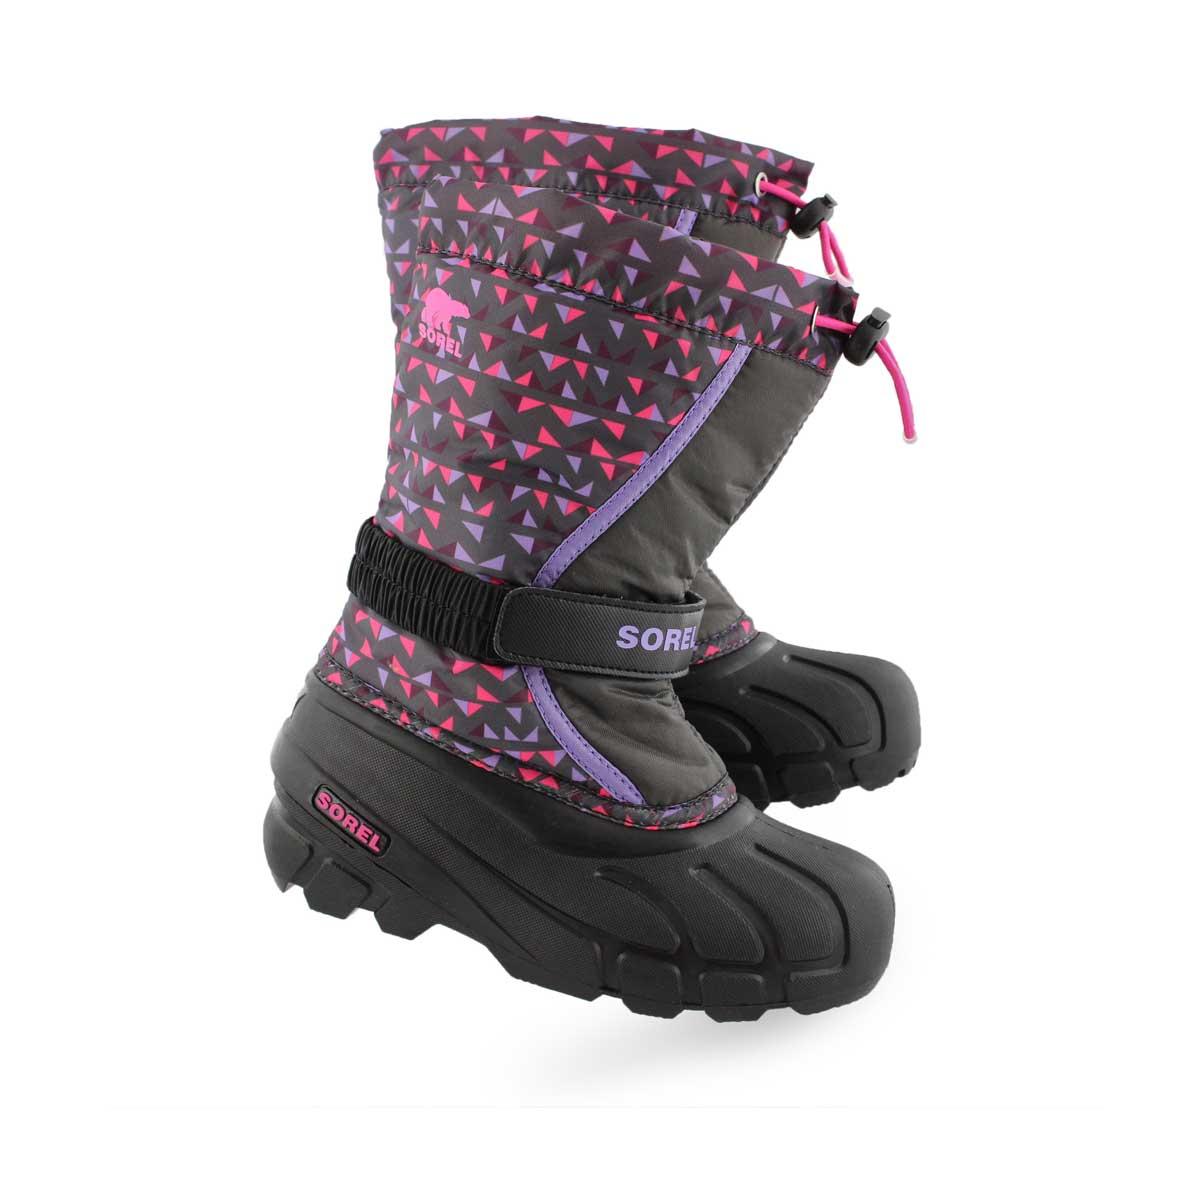 Grls Flurry Print gry/pnk winter boot